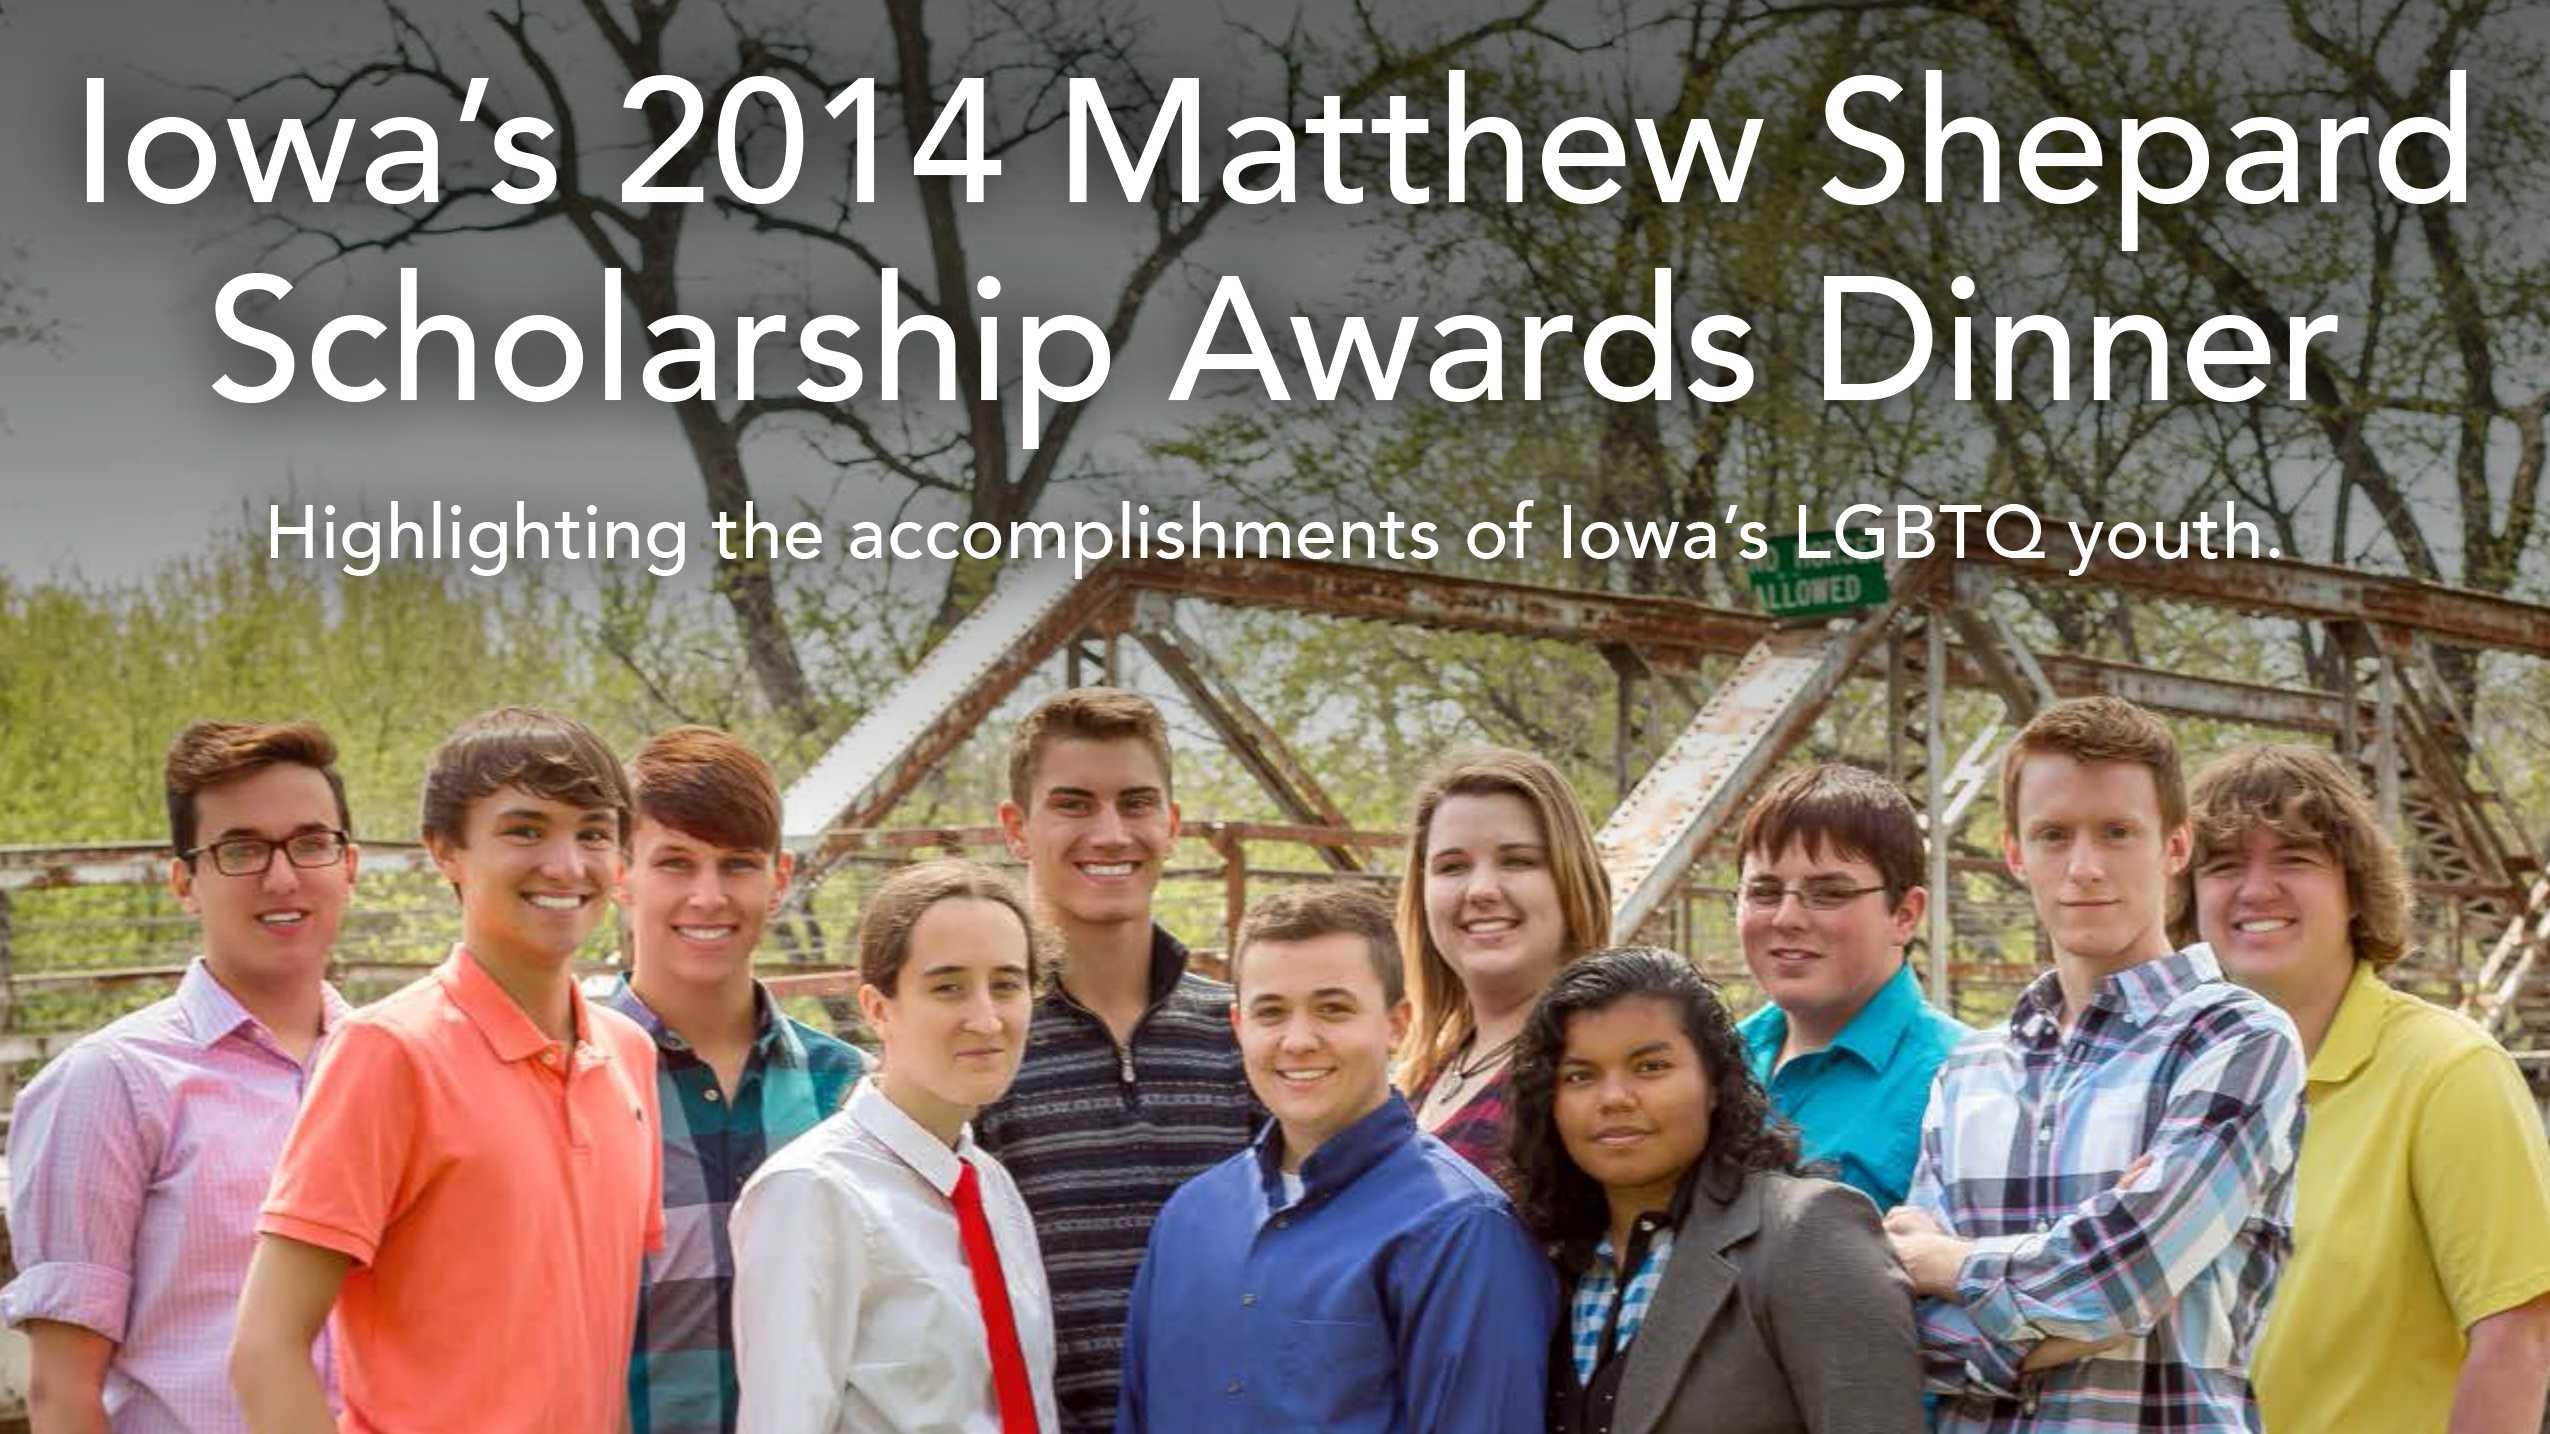 LGBTQ students honored during Iowa's Matthew Shepard Scholarship Dinner